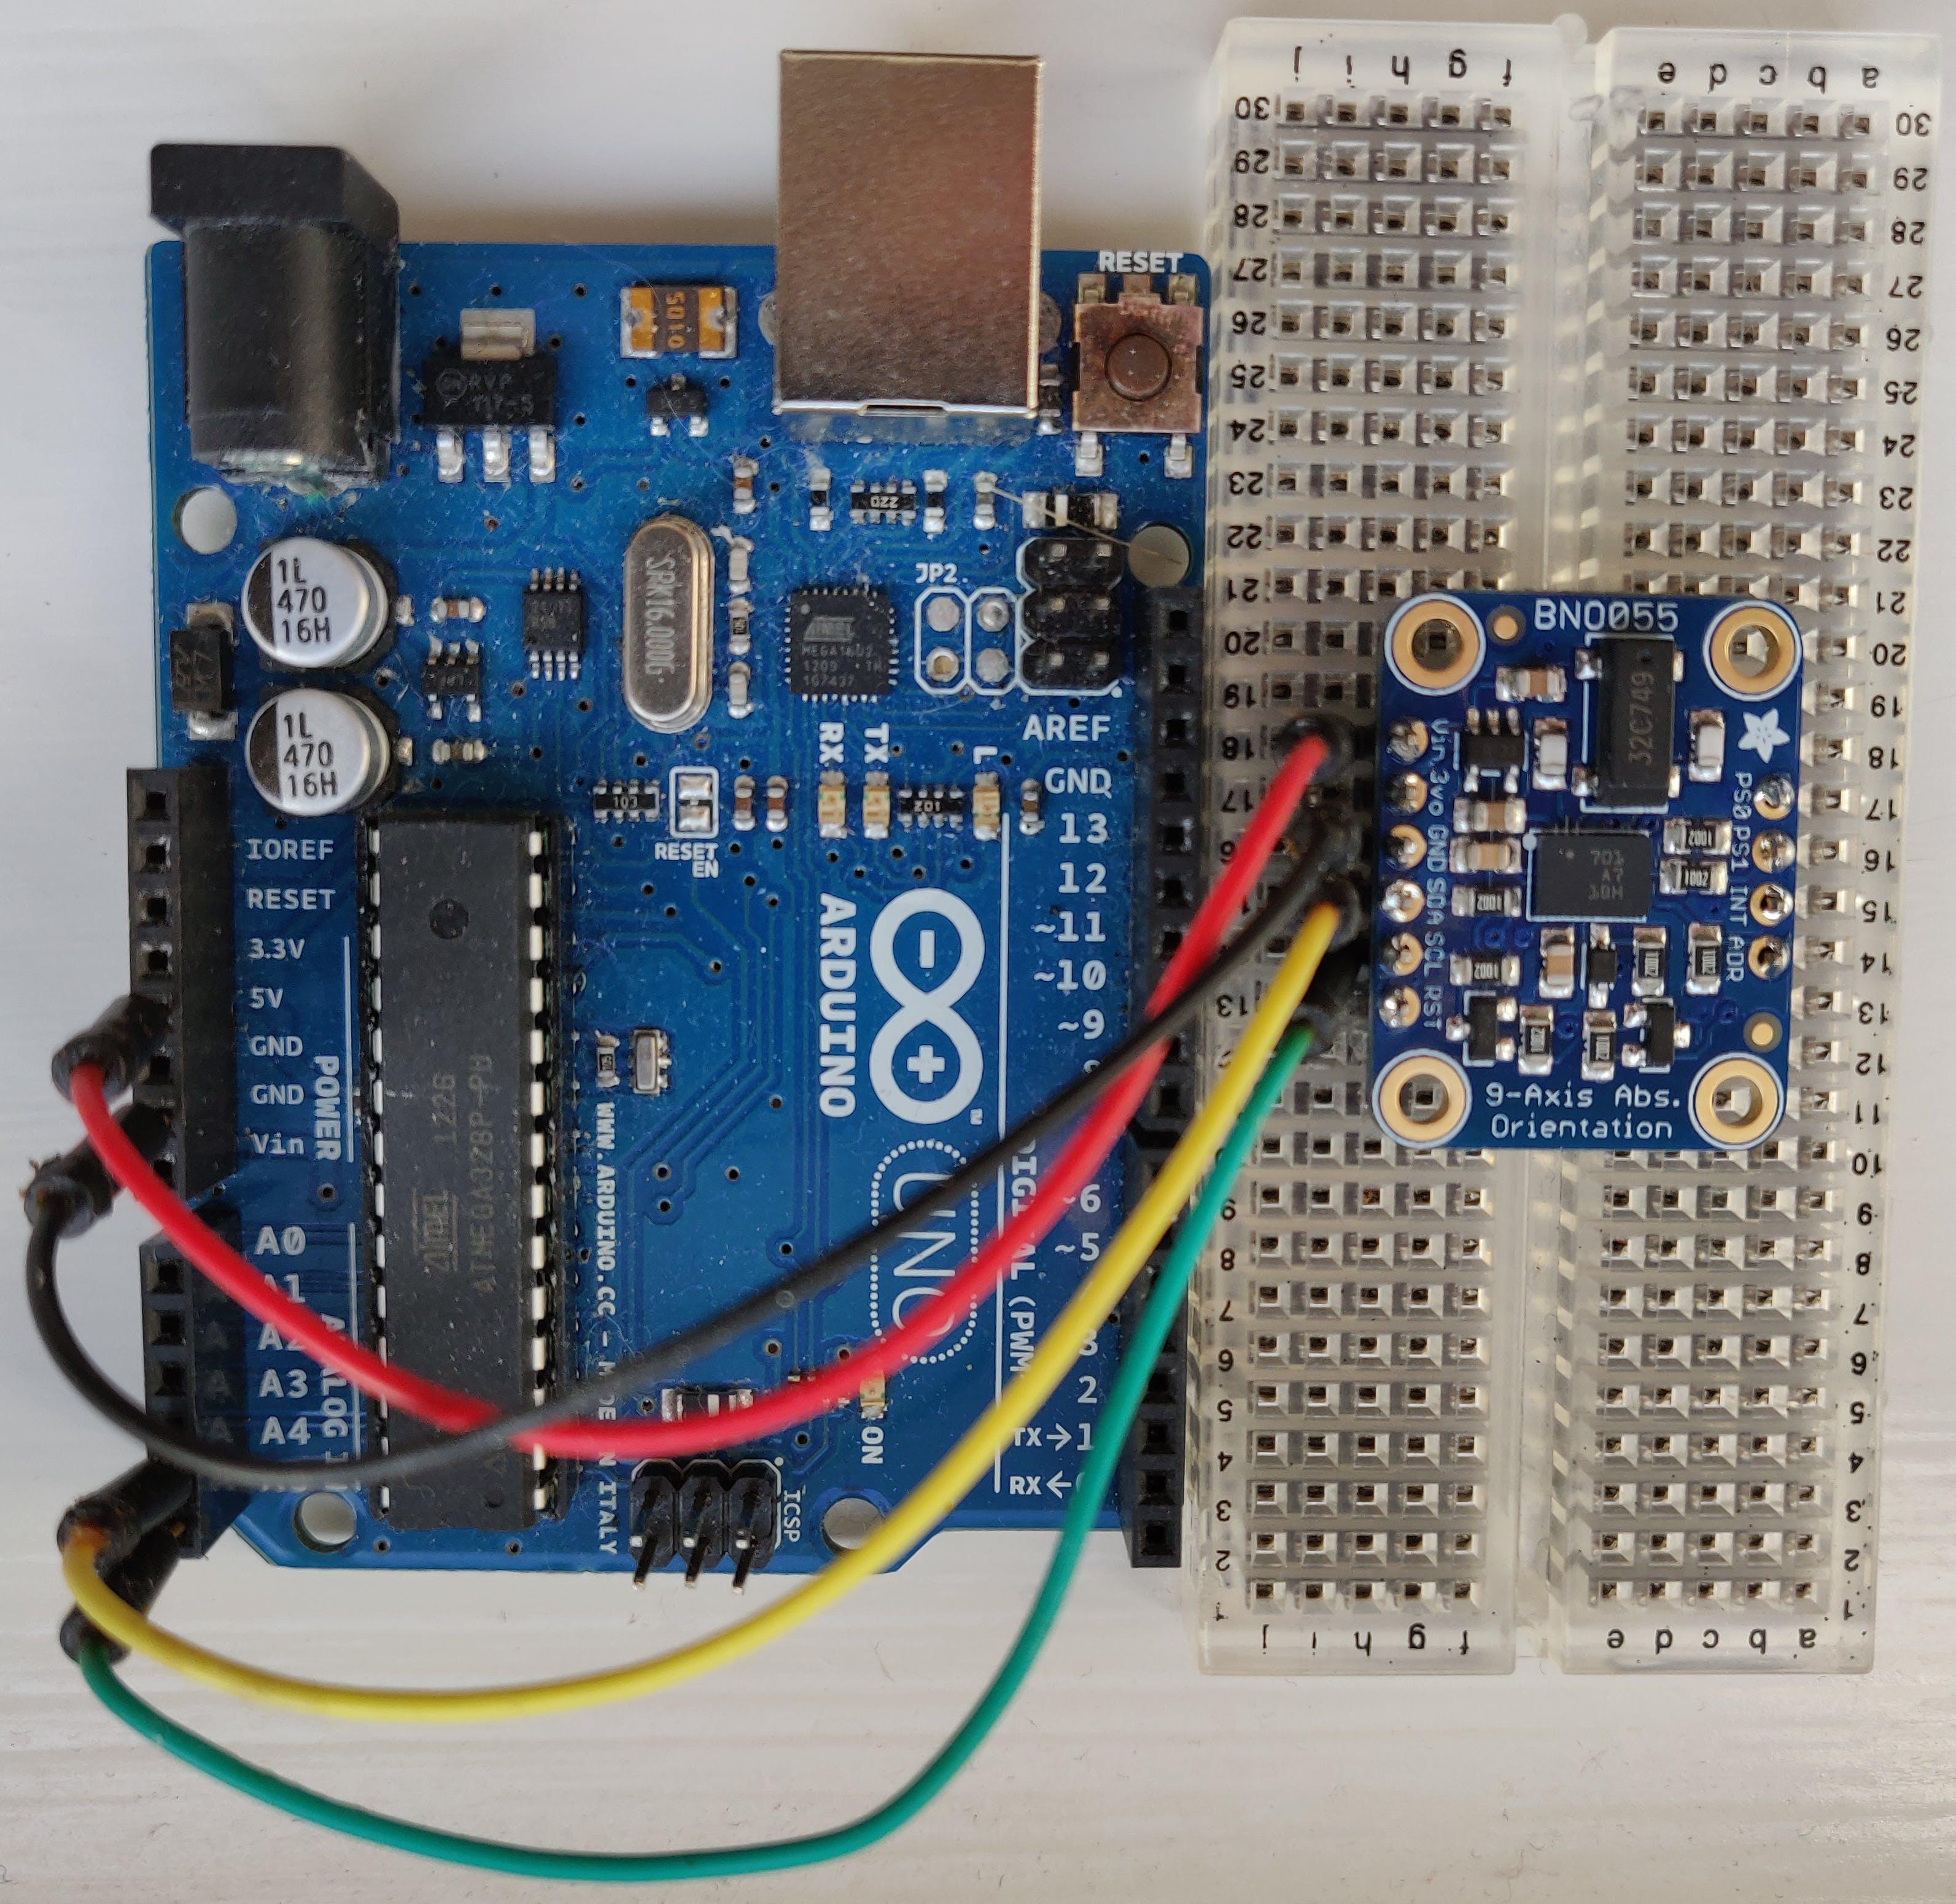 Wiring Adafruit BNO055 breakout to an Arduino Uno